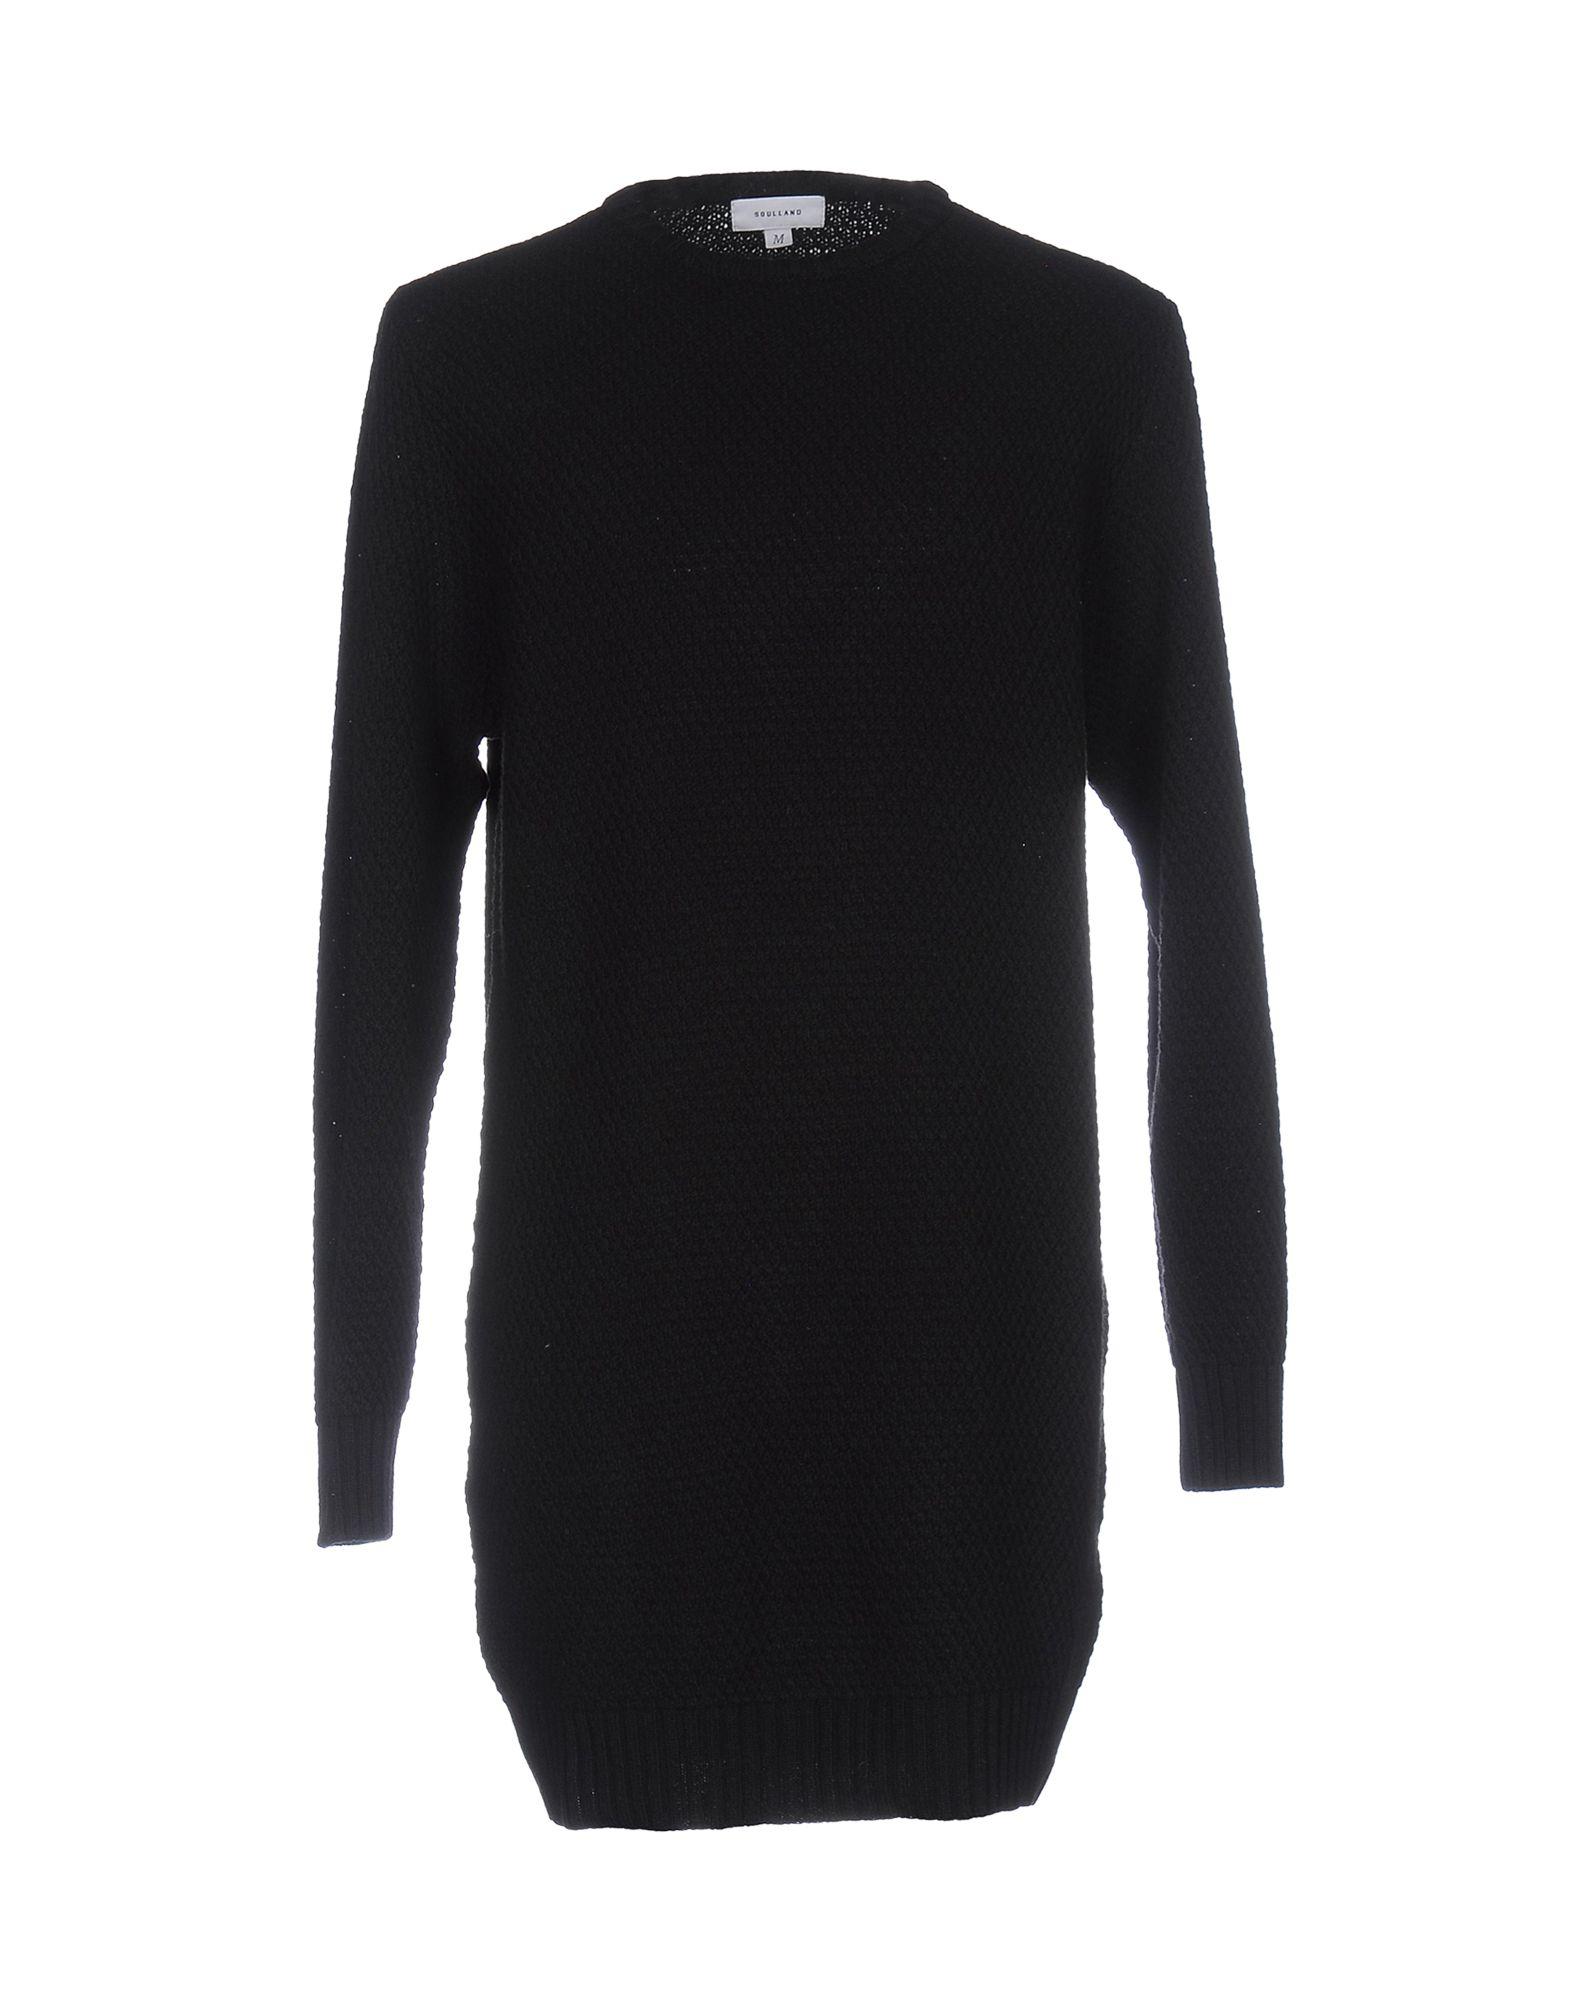 SOULLAND Sweater in Black